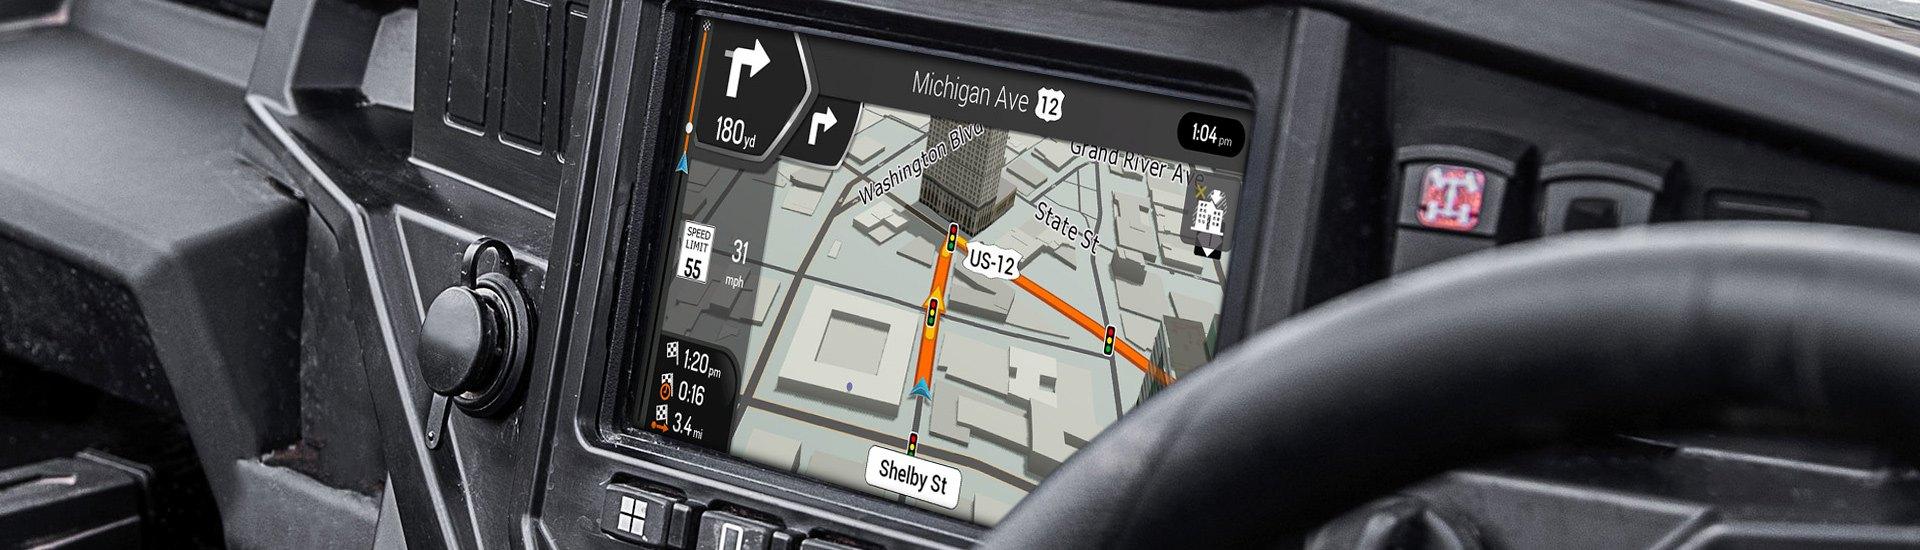 Powersports GPS & Navigation